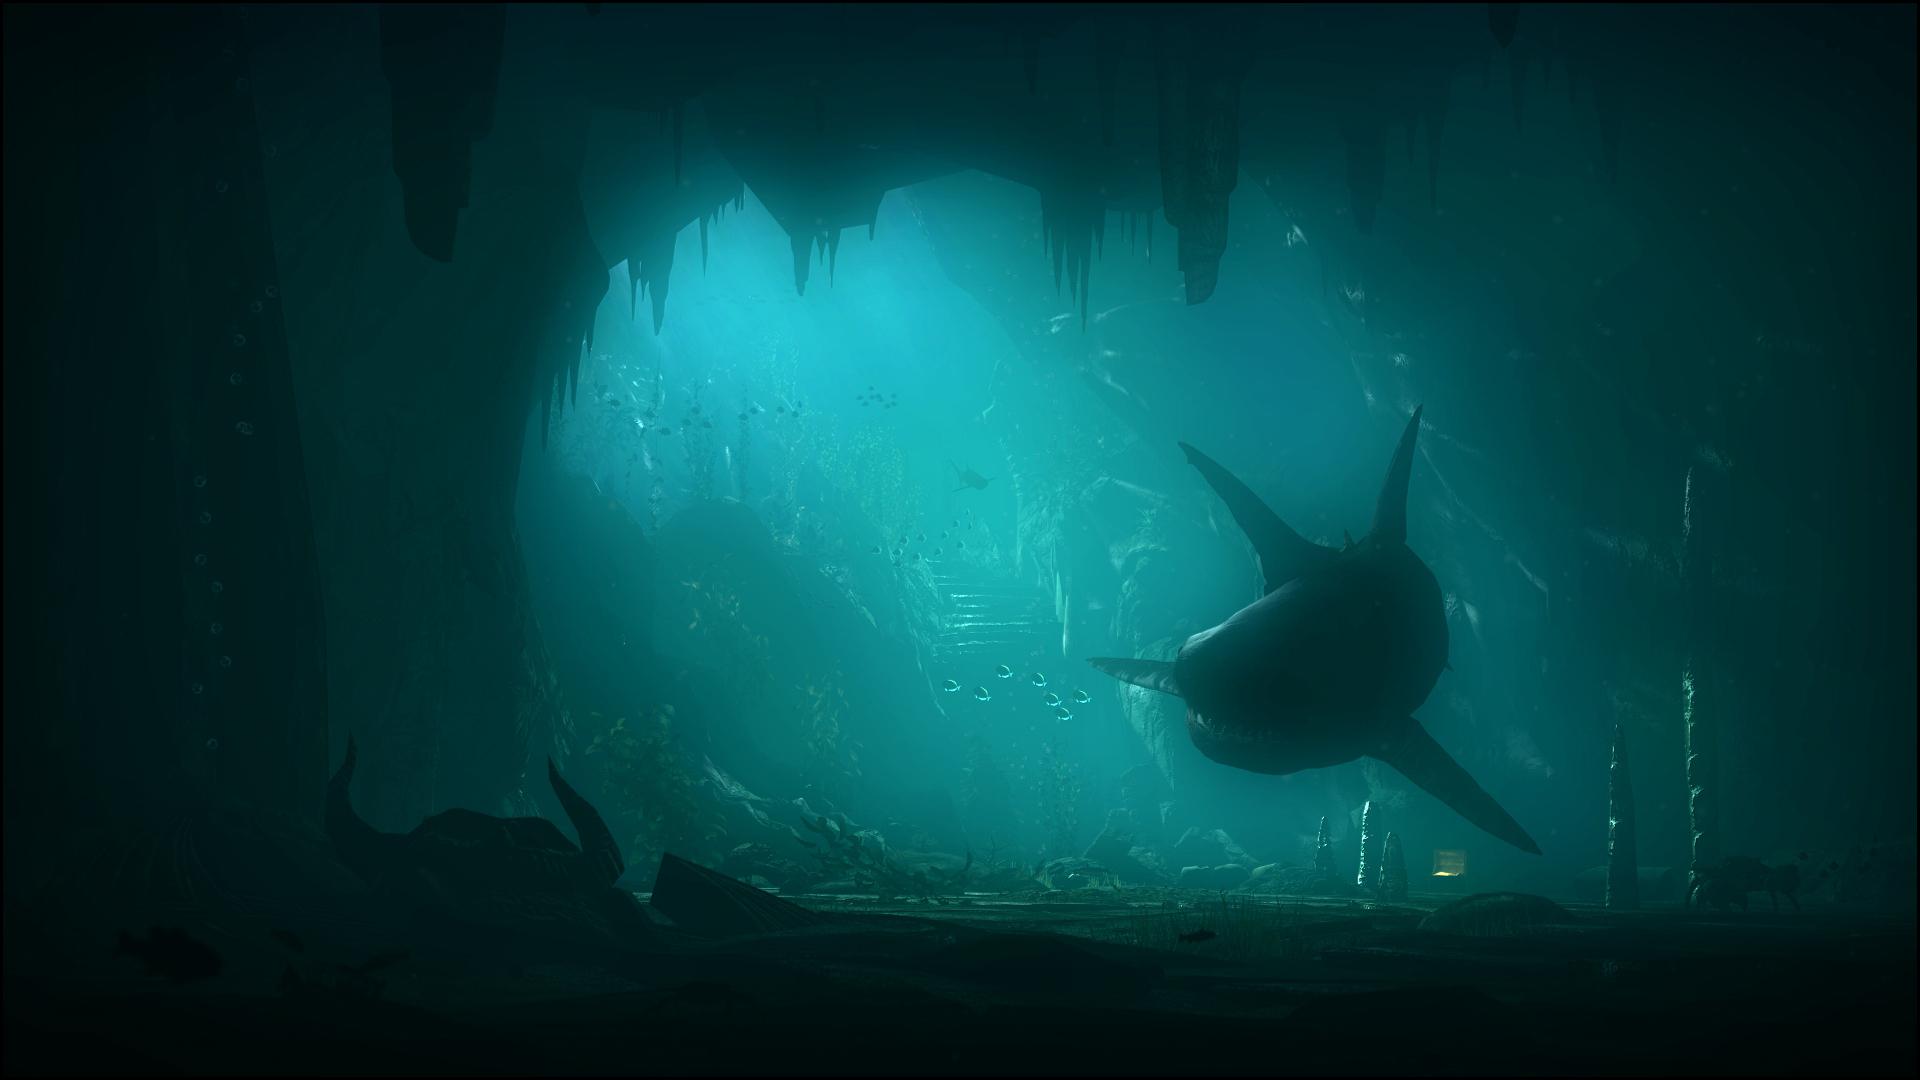 underwater hd wallpapers 1920x1080 wallpapersafari